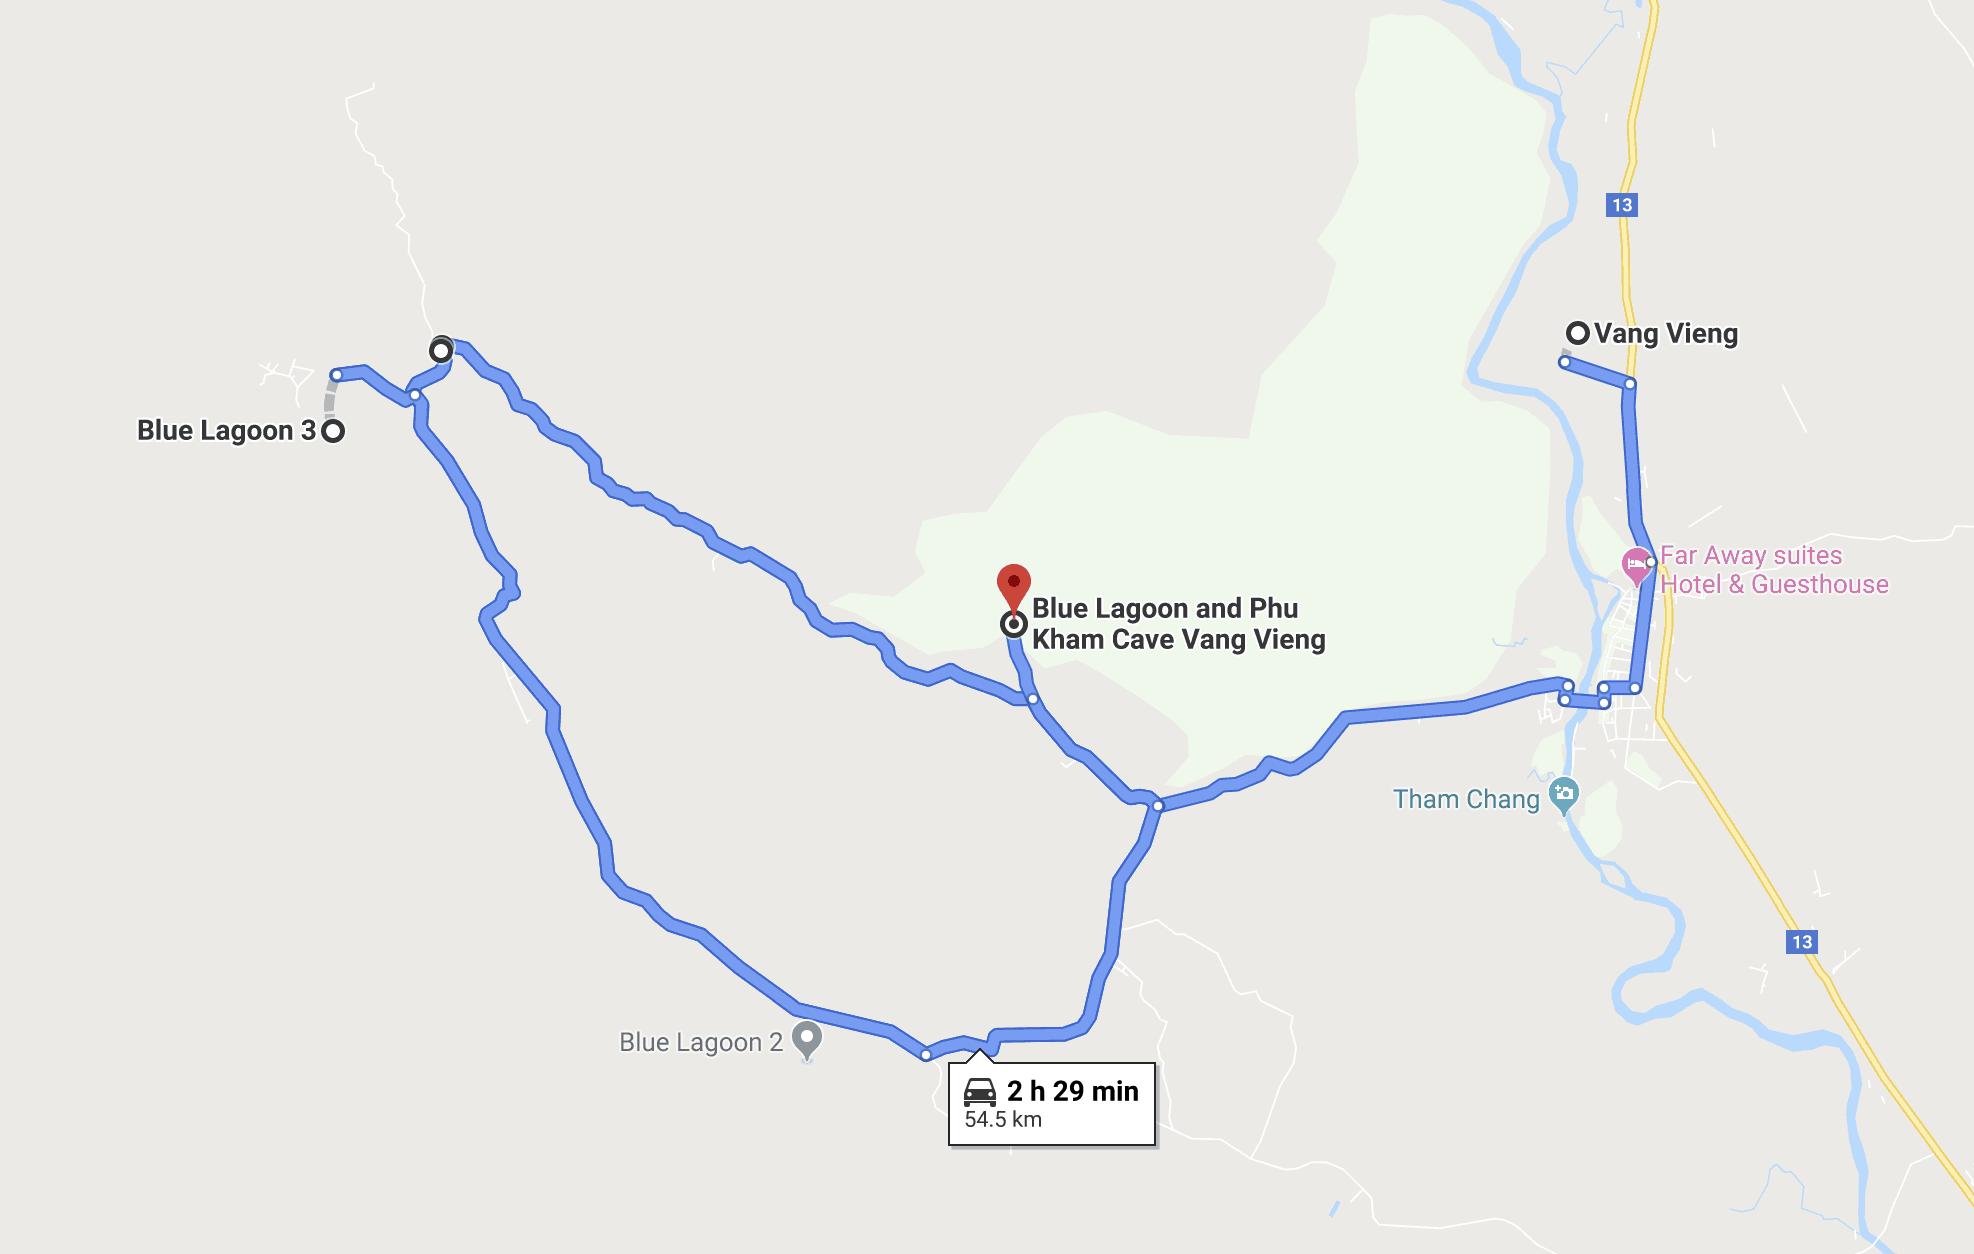 Map of the Small Motorbike Loop - Vang Vieng, Laos.